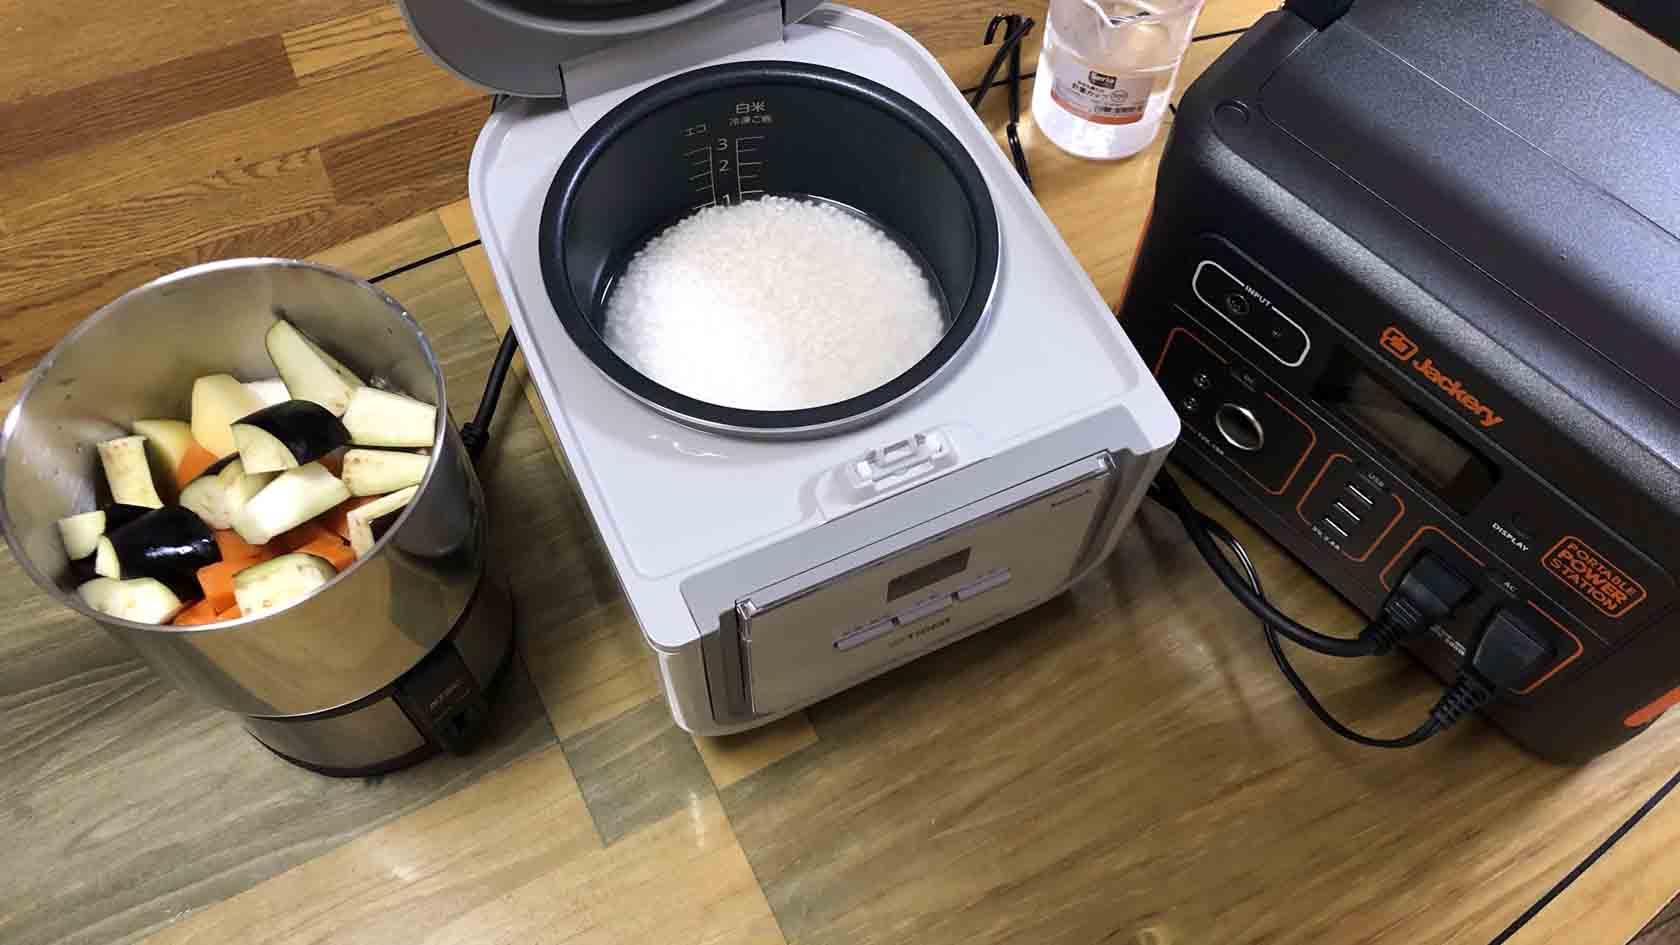 【Jackery ポータブル電源 700 レビュー】 炊飯器・クッカー同時使用でカレーライスを作れるか検証した。